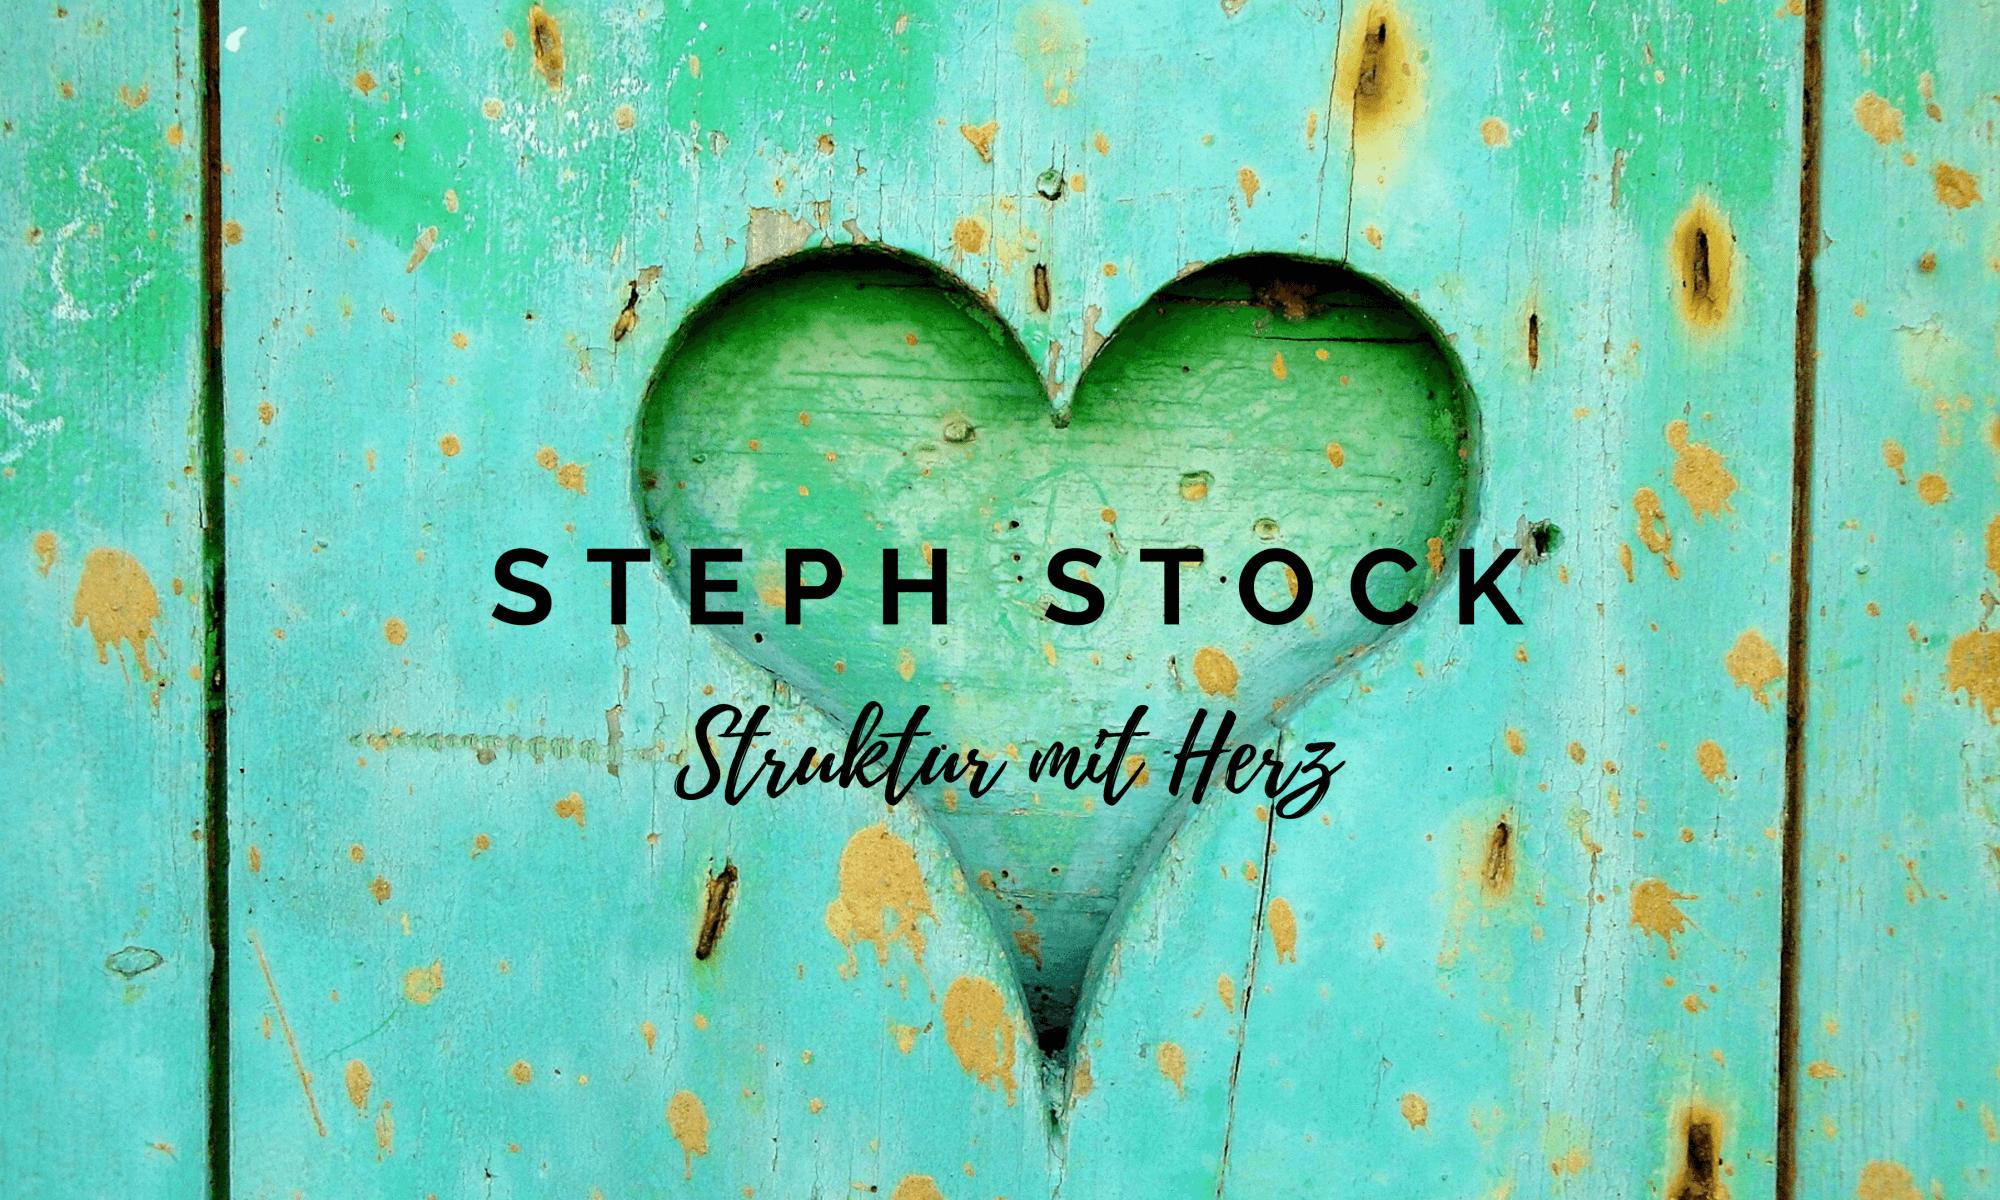 STEPH STOCKS BLOG